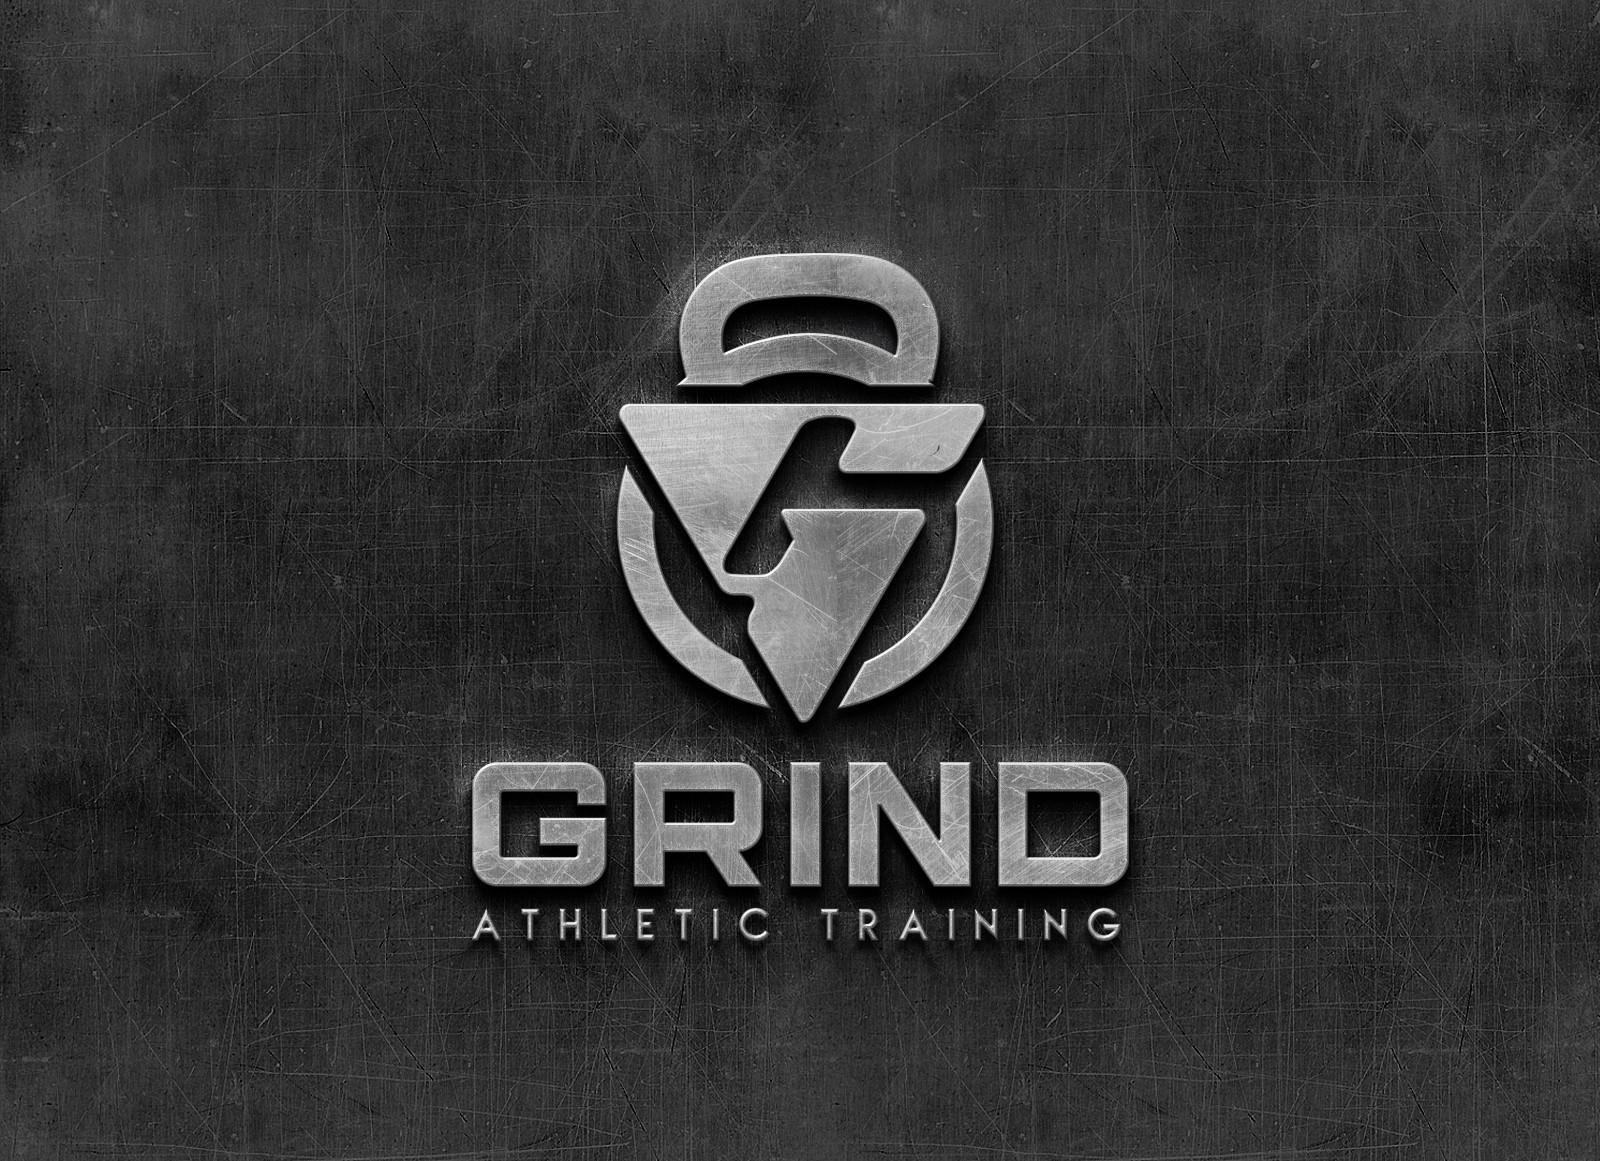 Modern logo for a Sports training fitness center.